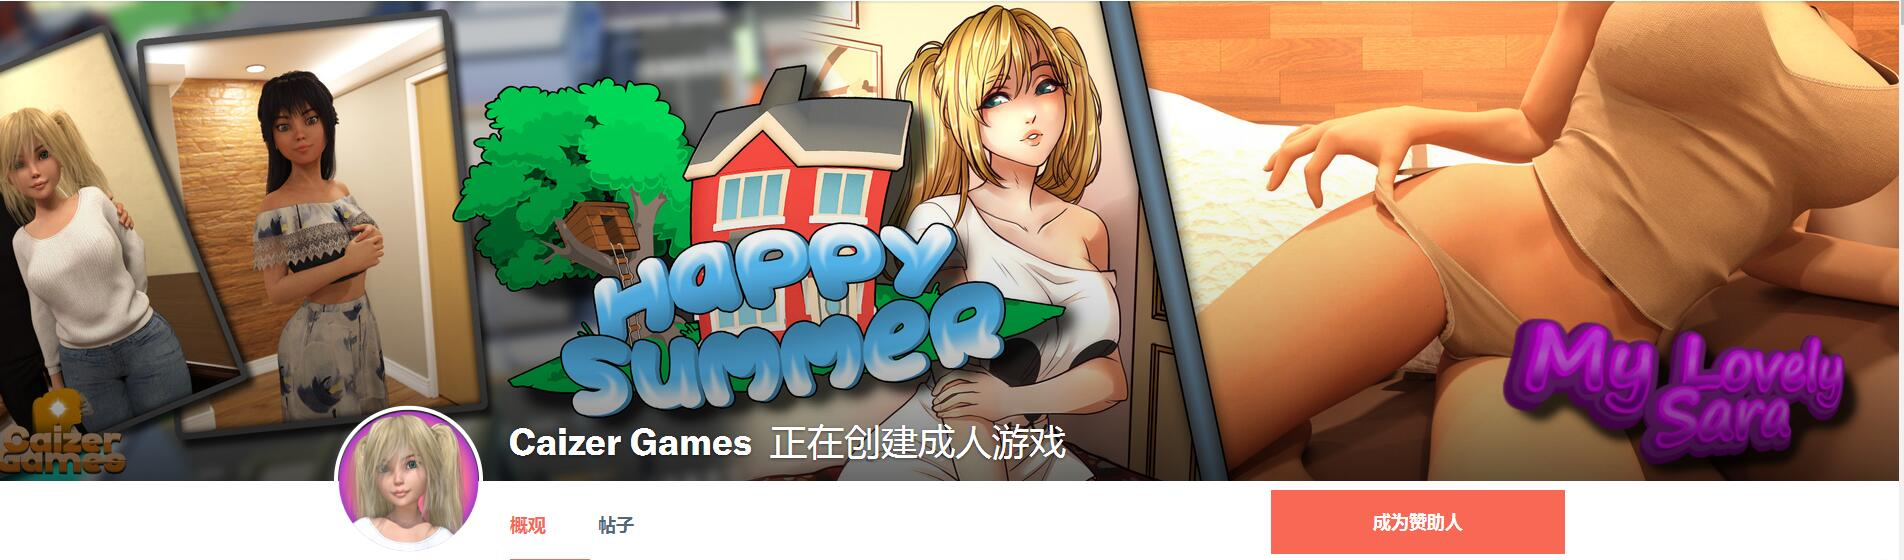 【SLG/汉化/动态CG】快乐的暑假 Happy Summer-V0.19 【PC+安卓】【1.2G】1912155